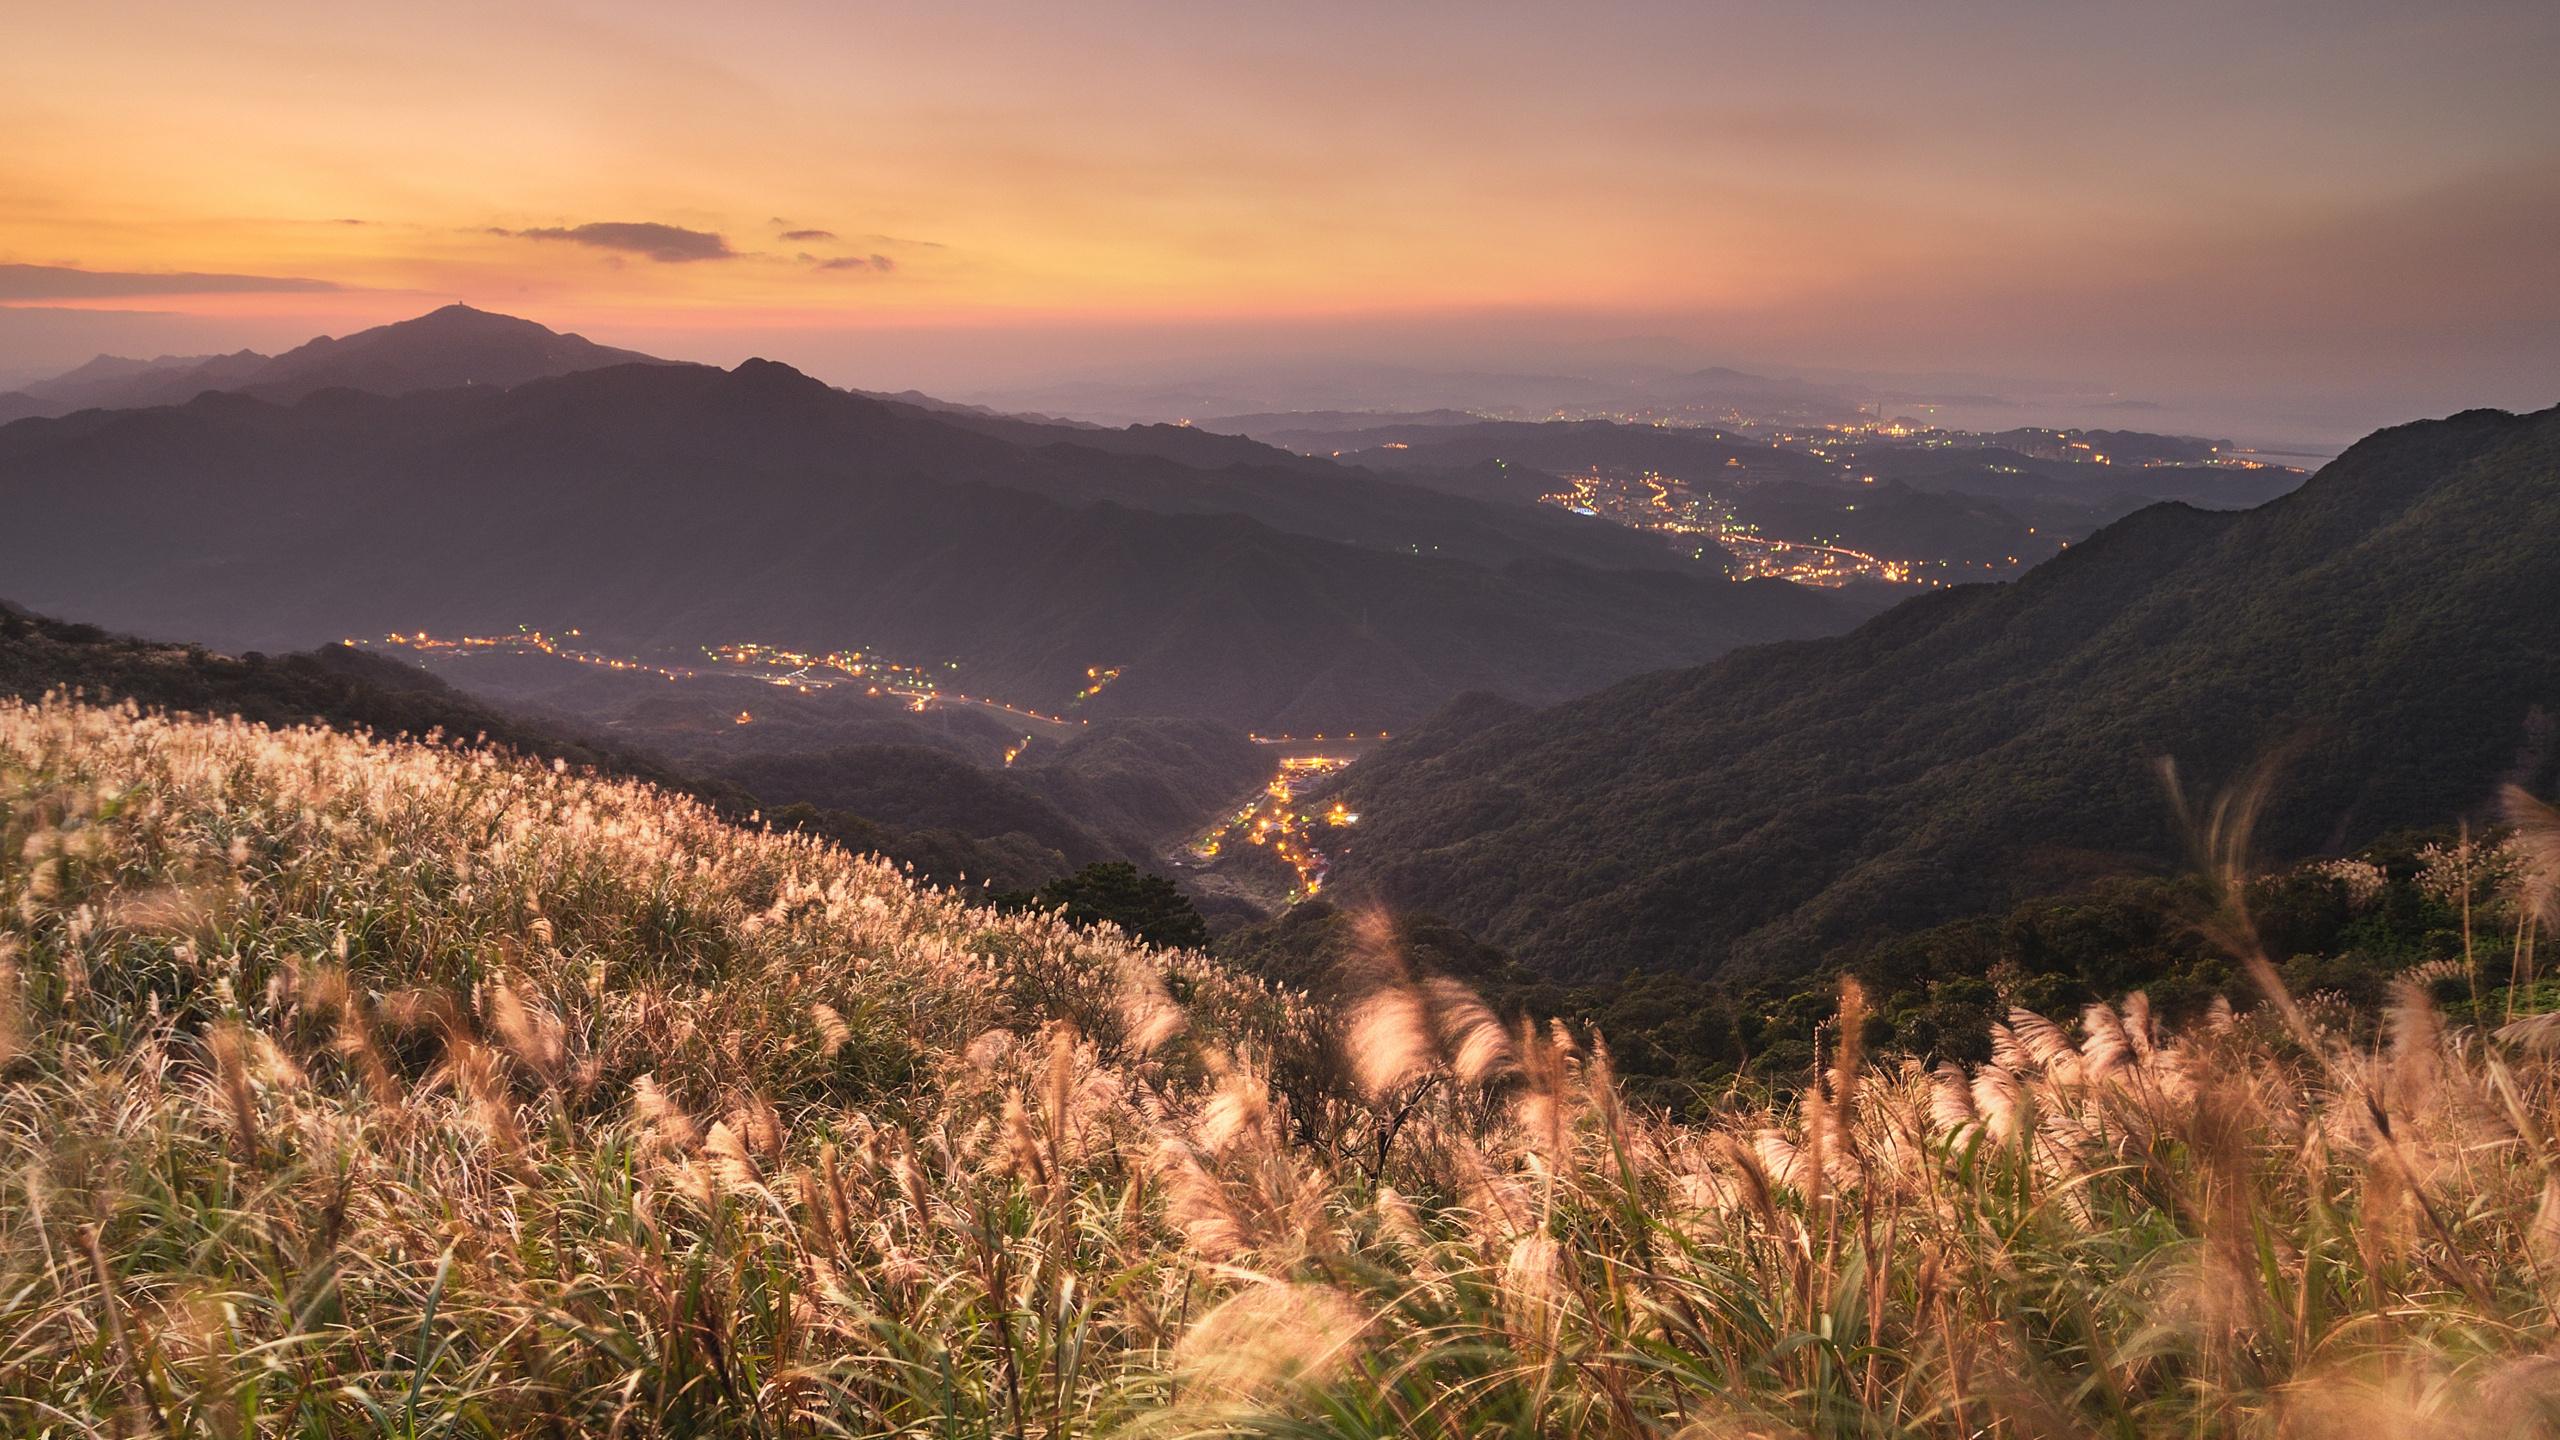 Города, места, трава, китай, вид, пейзажи, горы, вид, панорама, вечер, огни, небо, ночное небо, огни городов